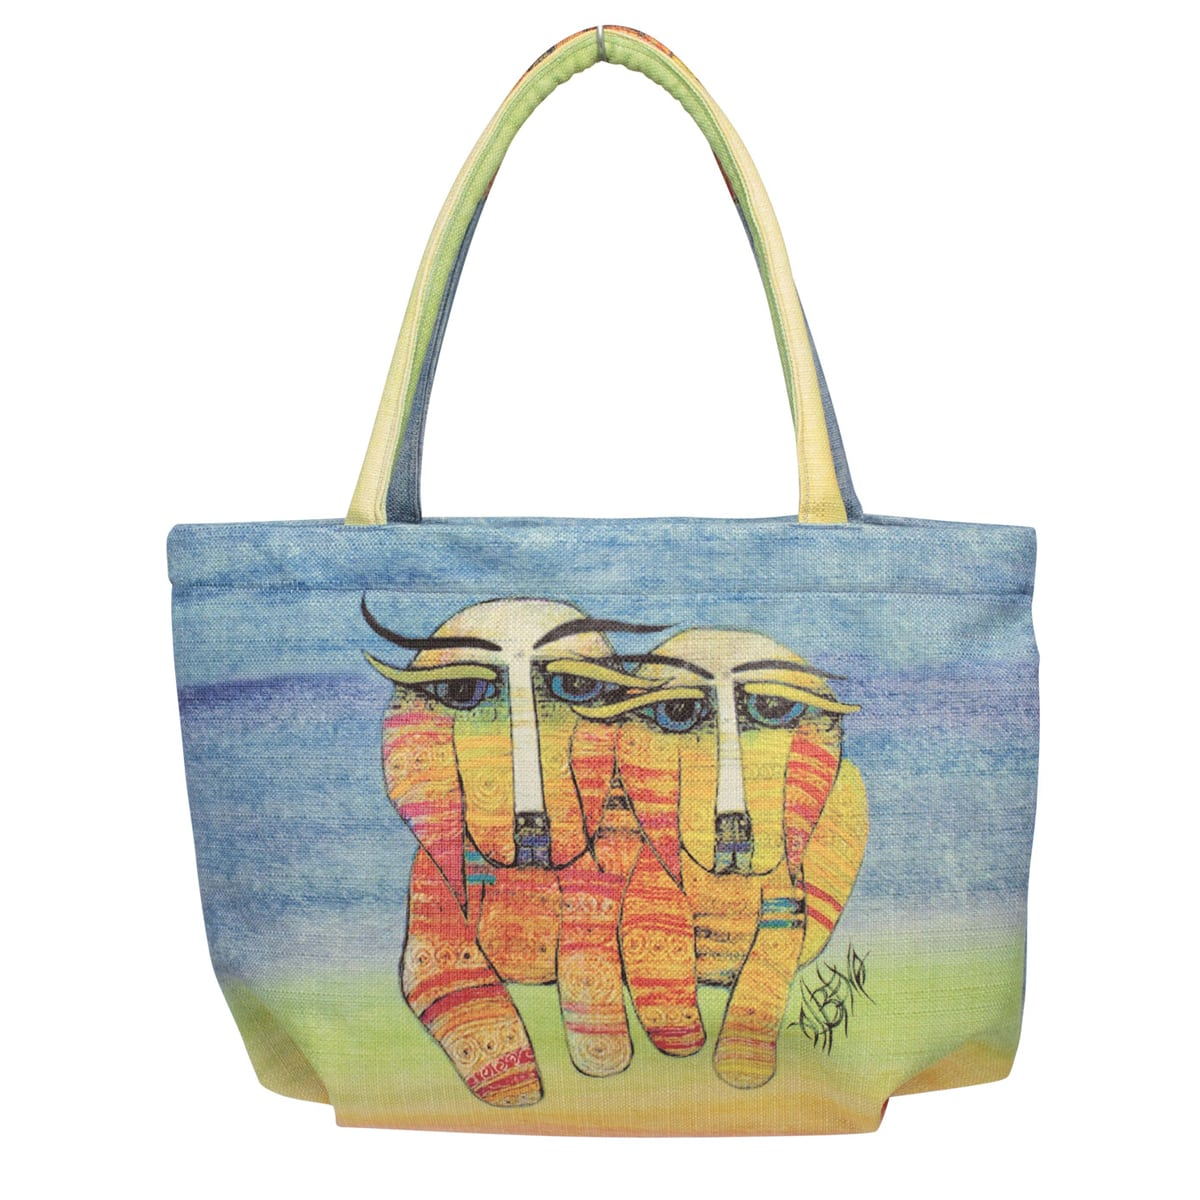 Dog Totes for Dog Lovers - Bubble Handbag with Dog Art by Albena